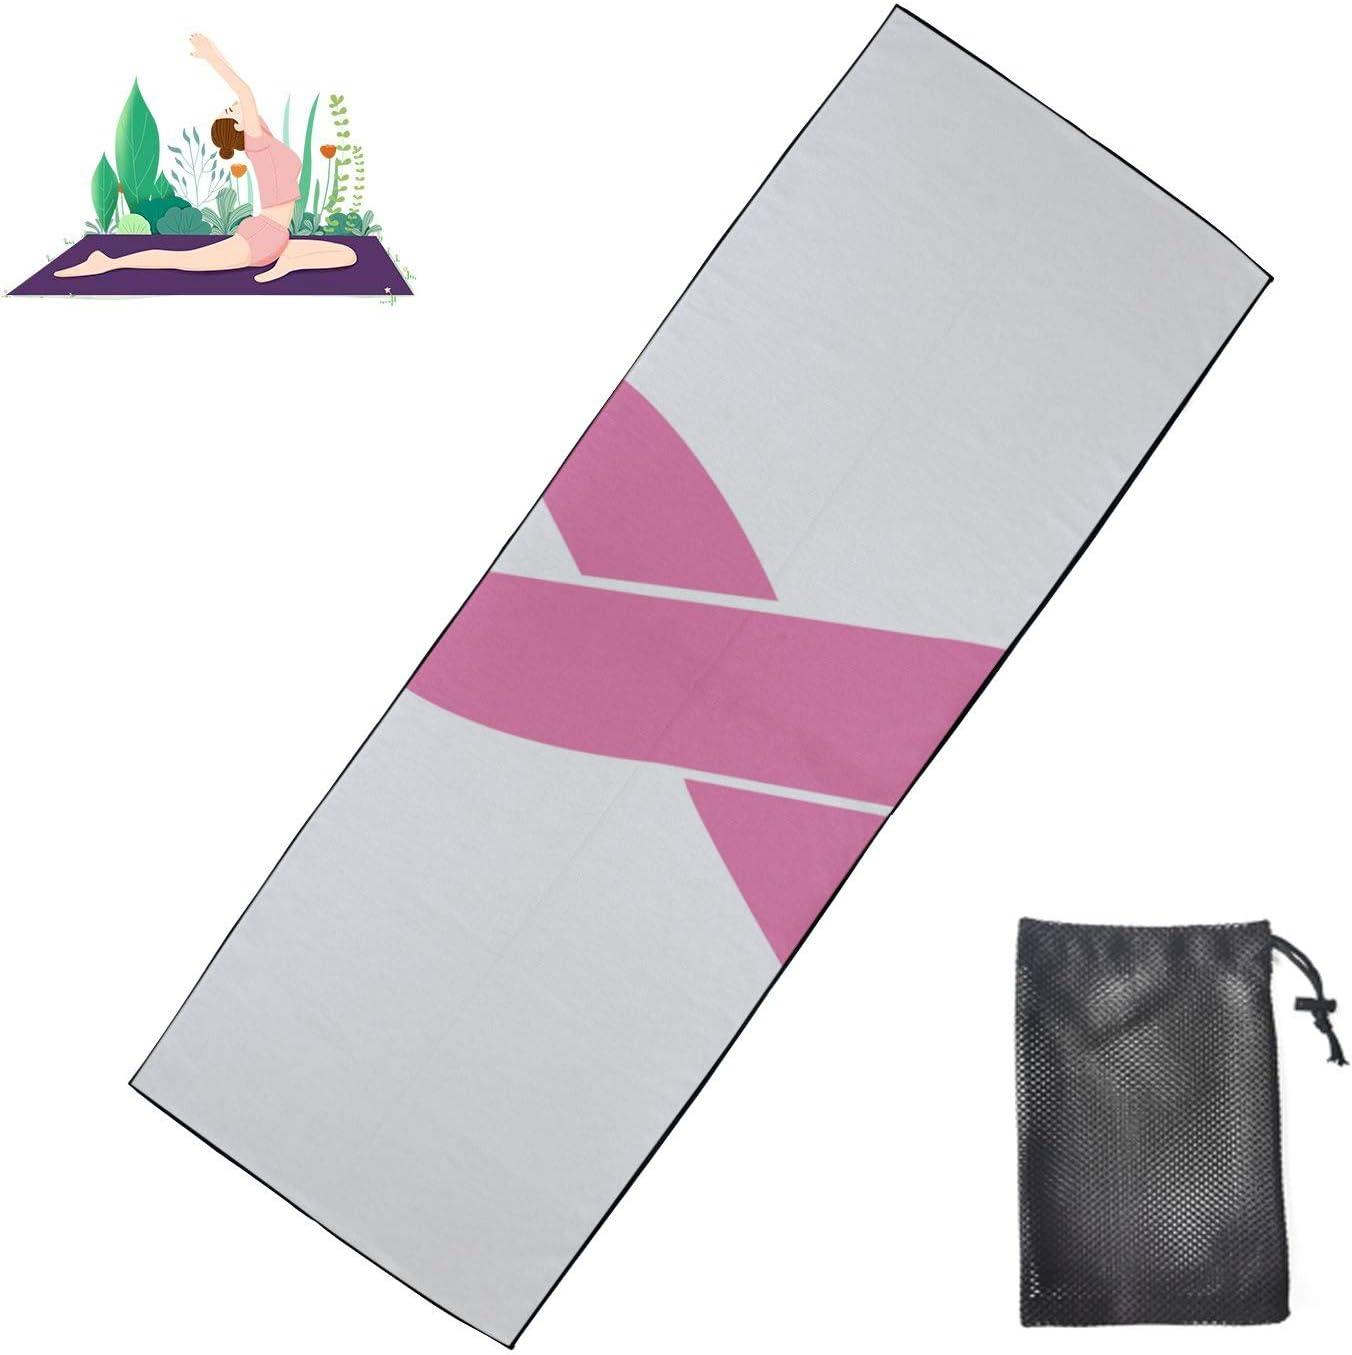 Zaqiwa Non Slip online shopping Hot Yoga Towel Regular discount Pink Ribb Breast Awareness Cancer